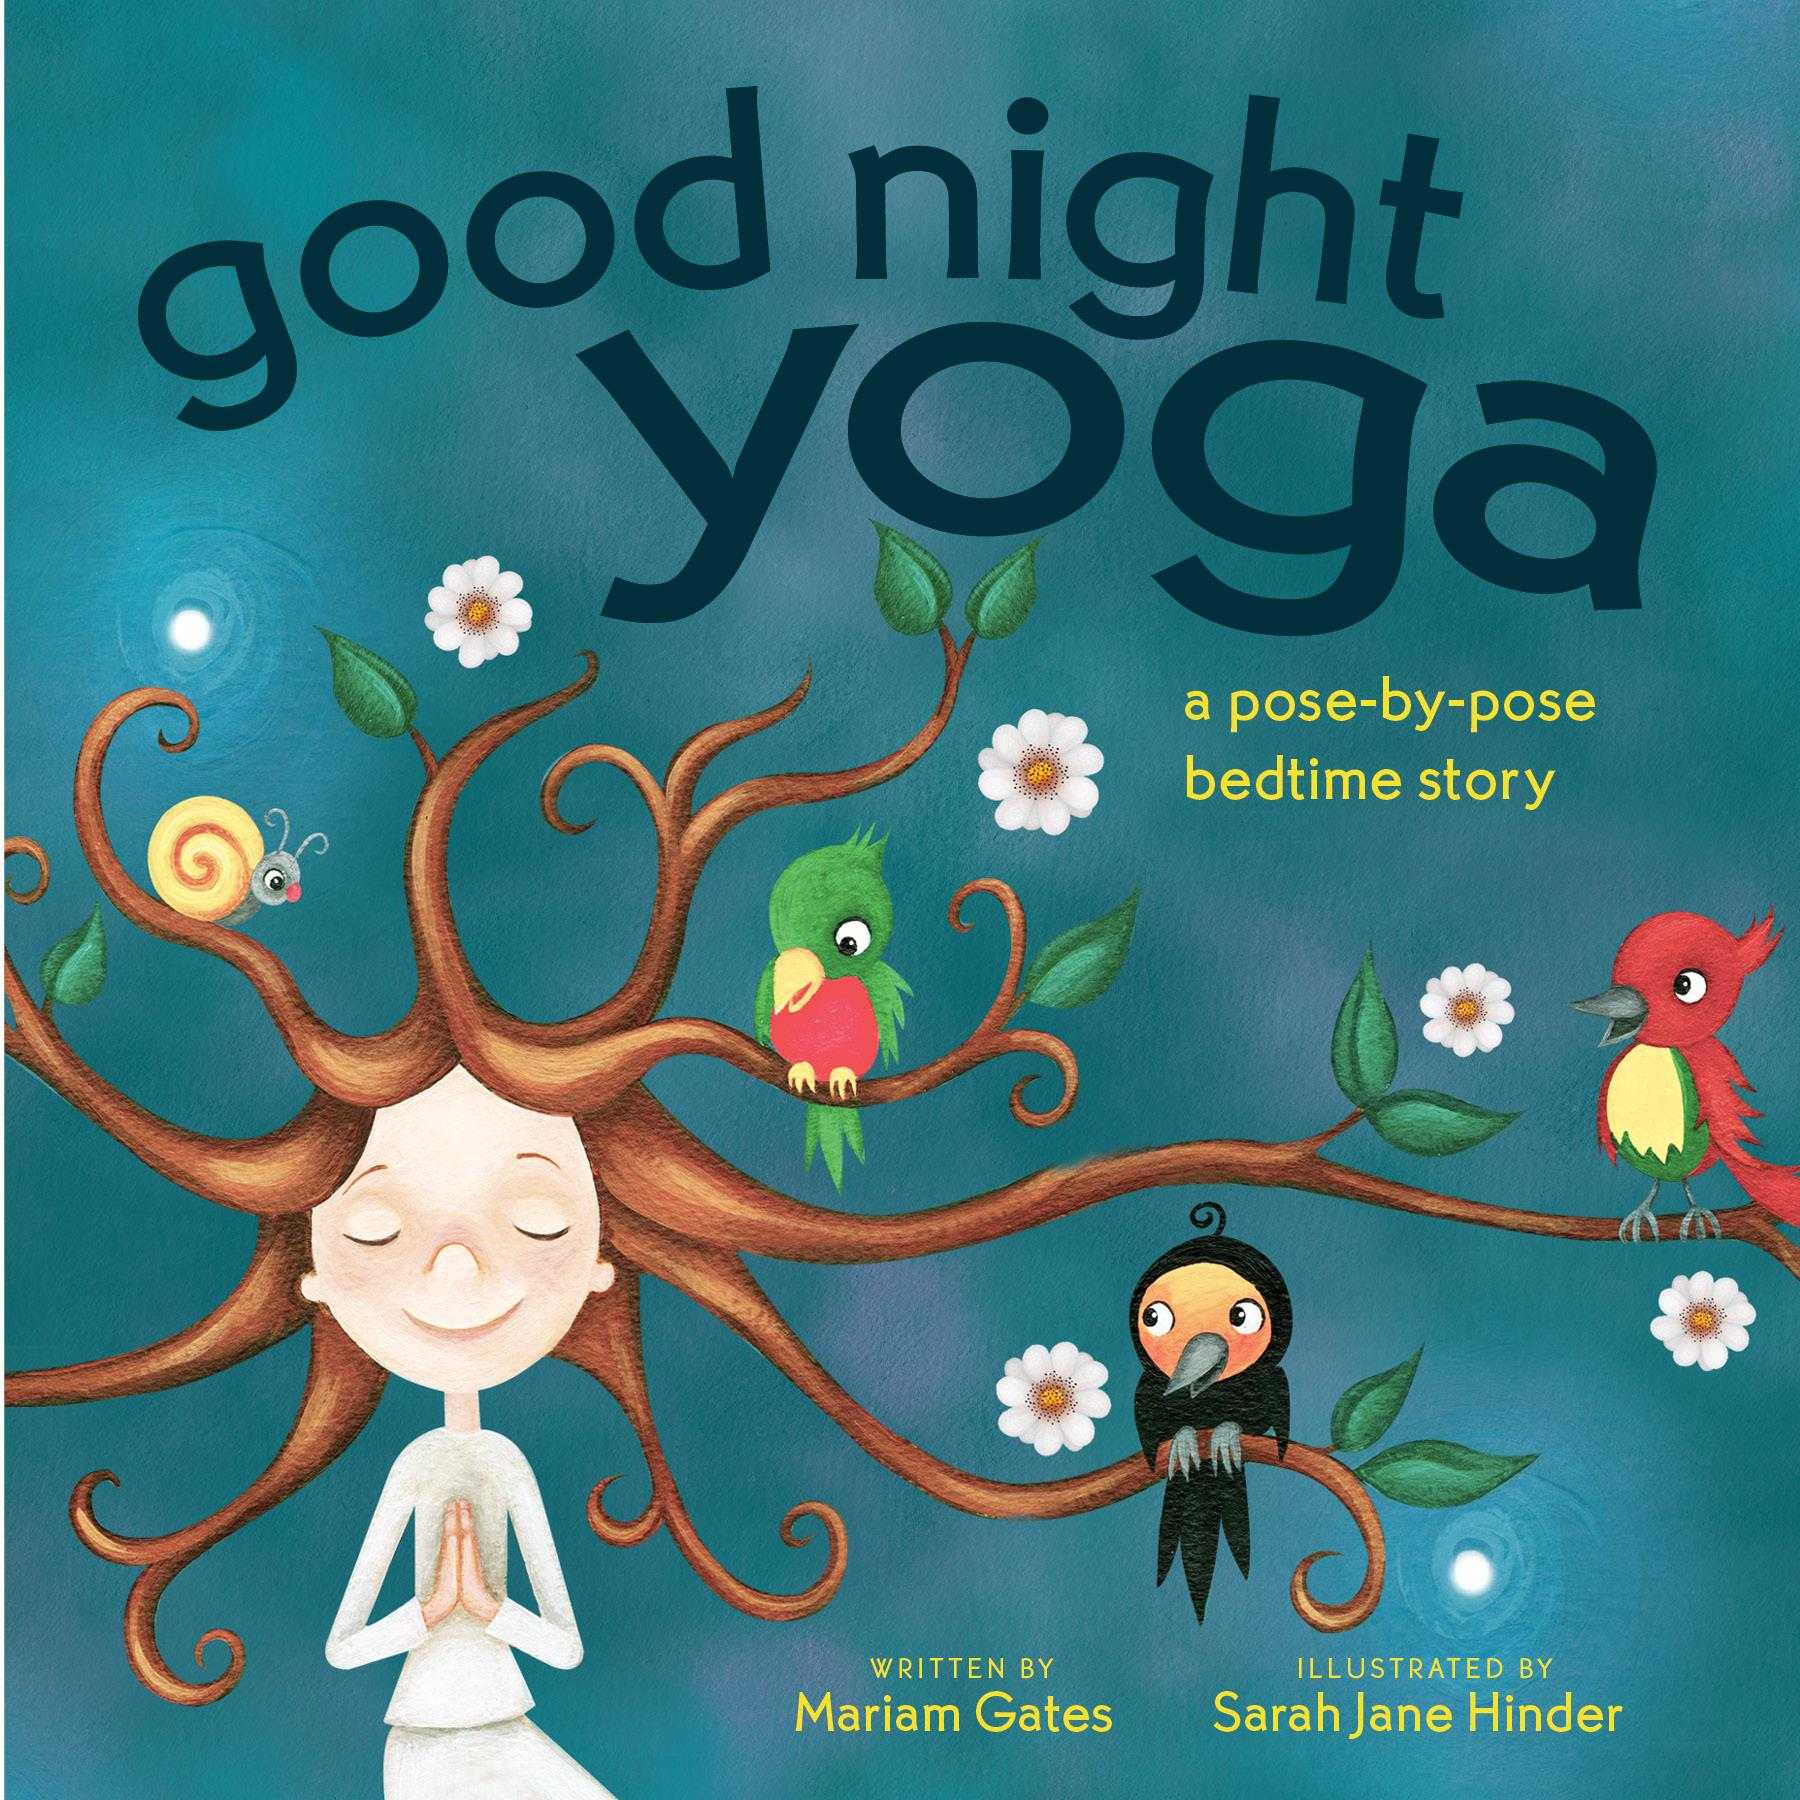 Good Night Yoga : A Pose-By-Pose Bedtime Story - Walmart.com